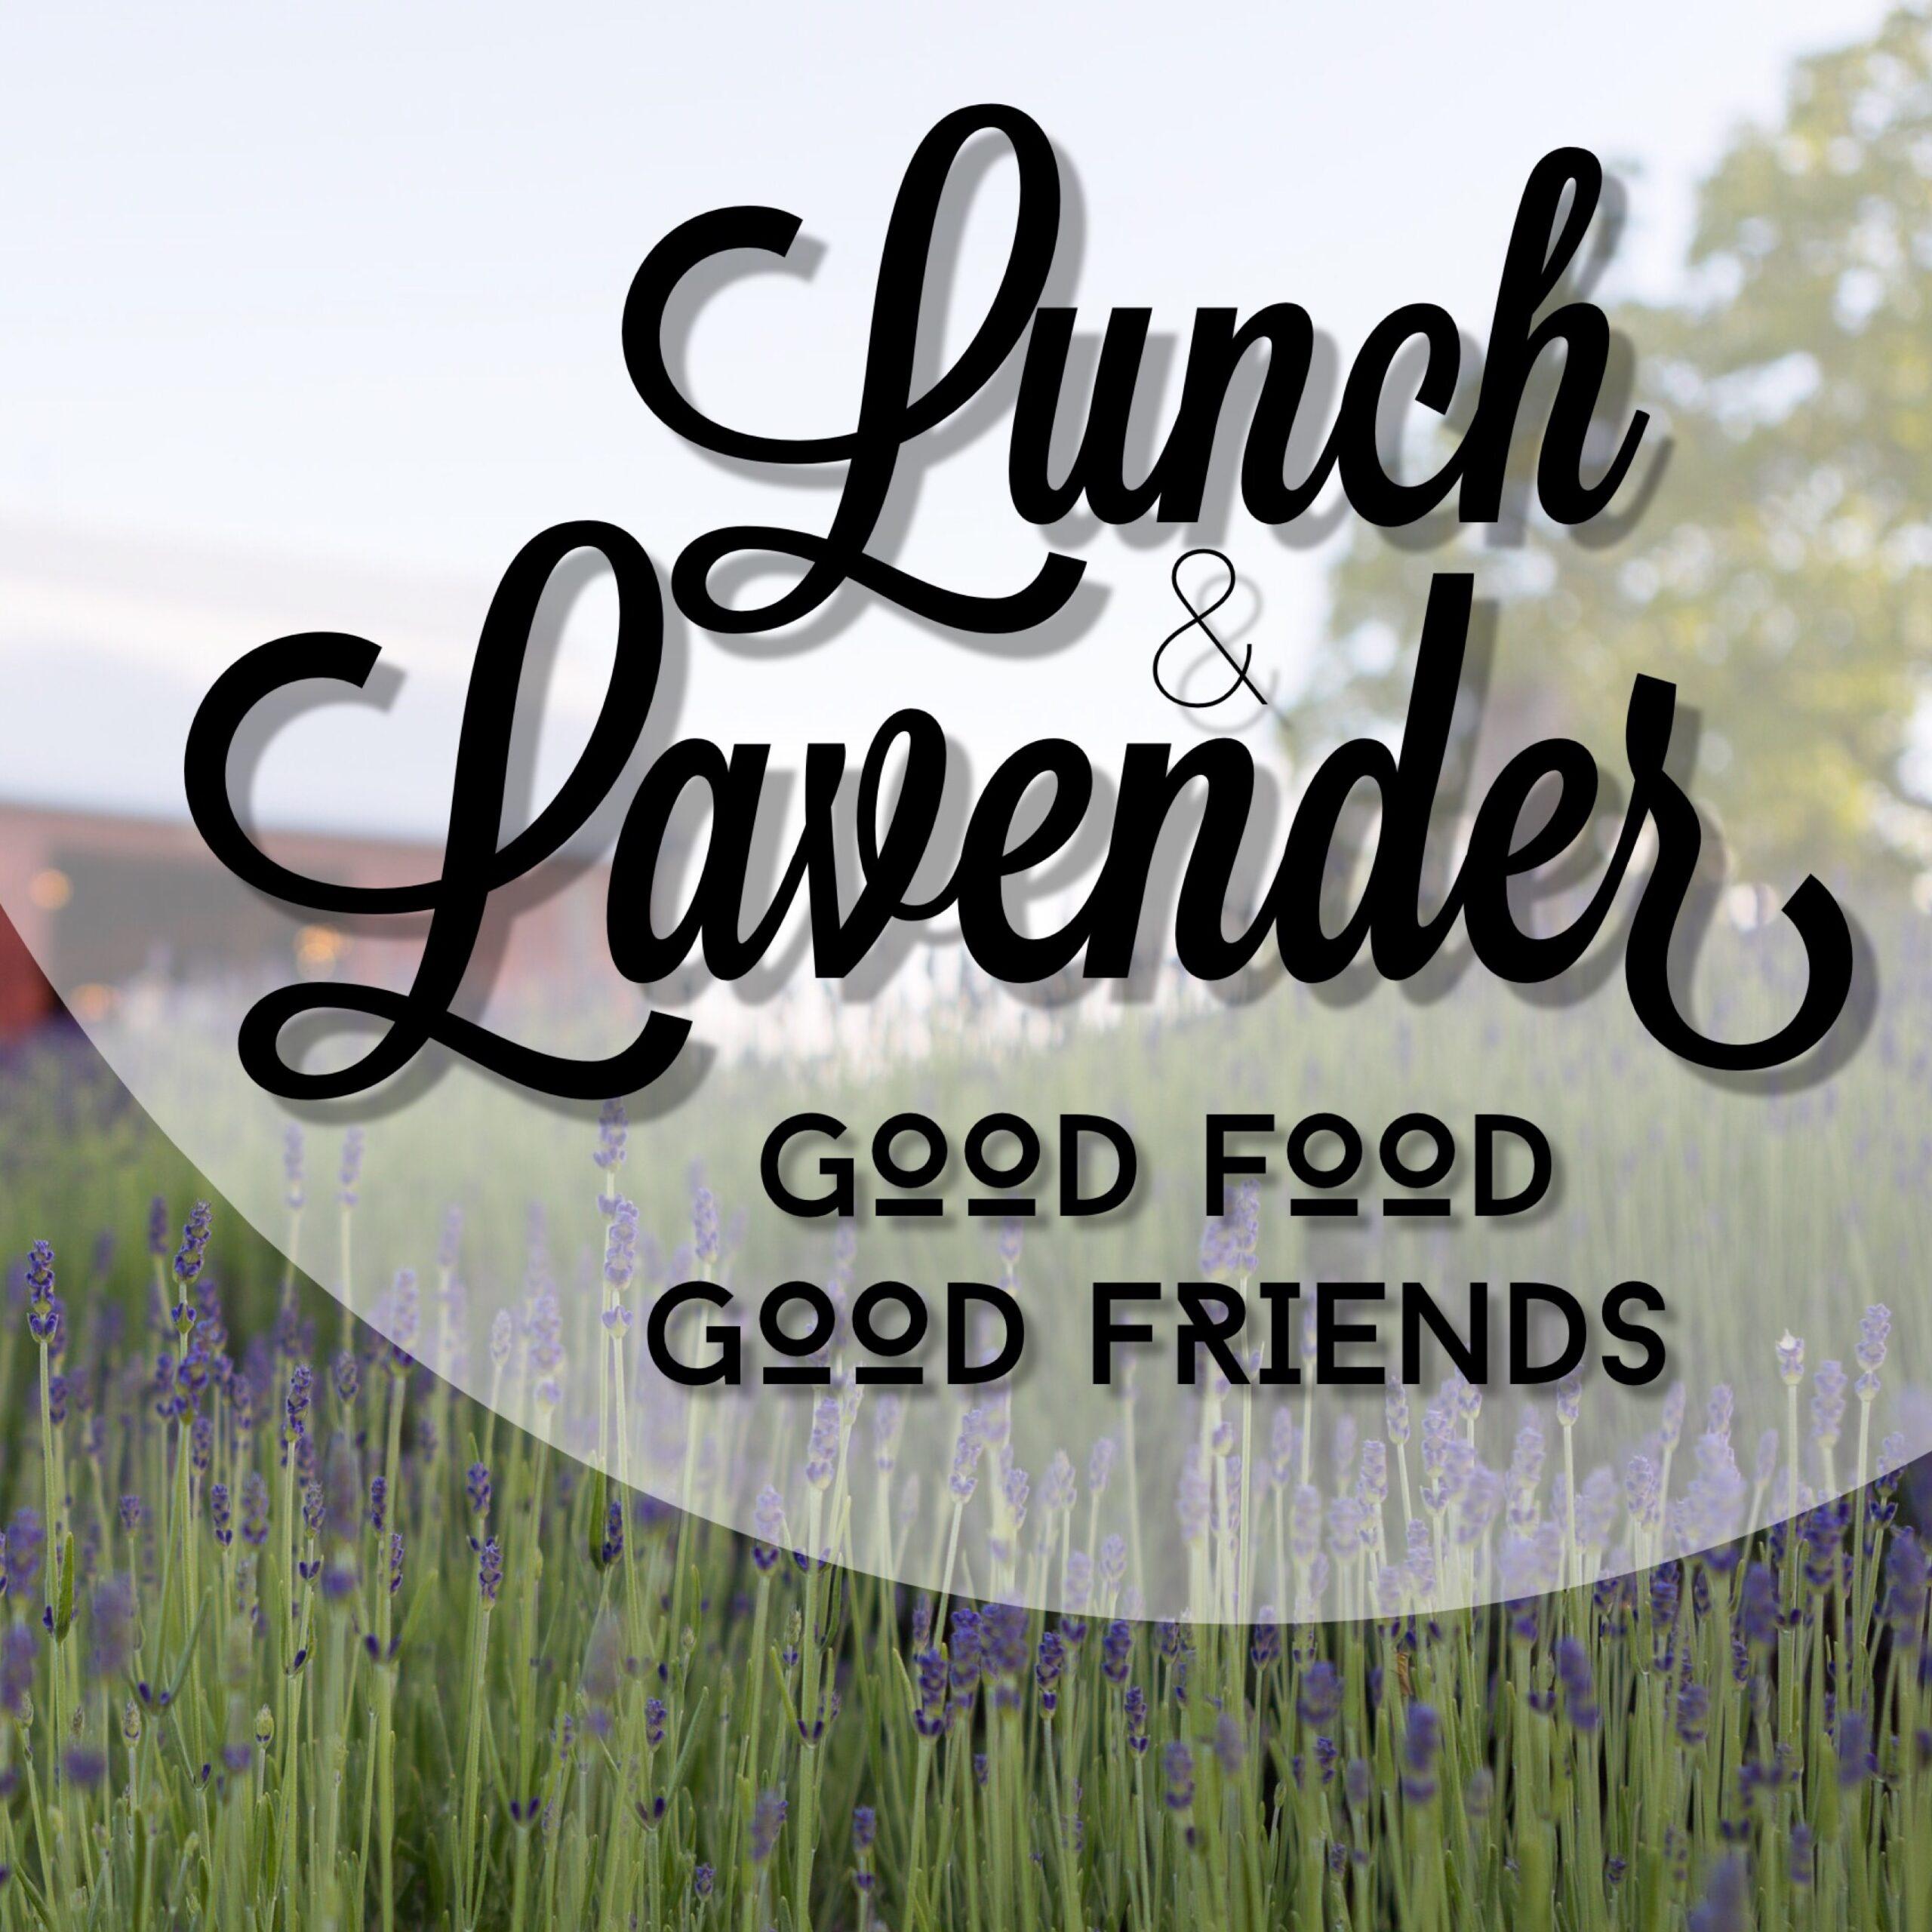 Lunch & Lavender